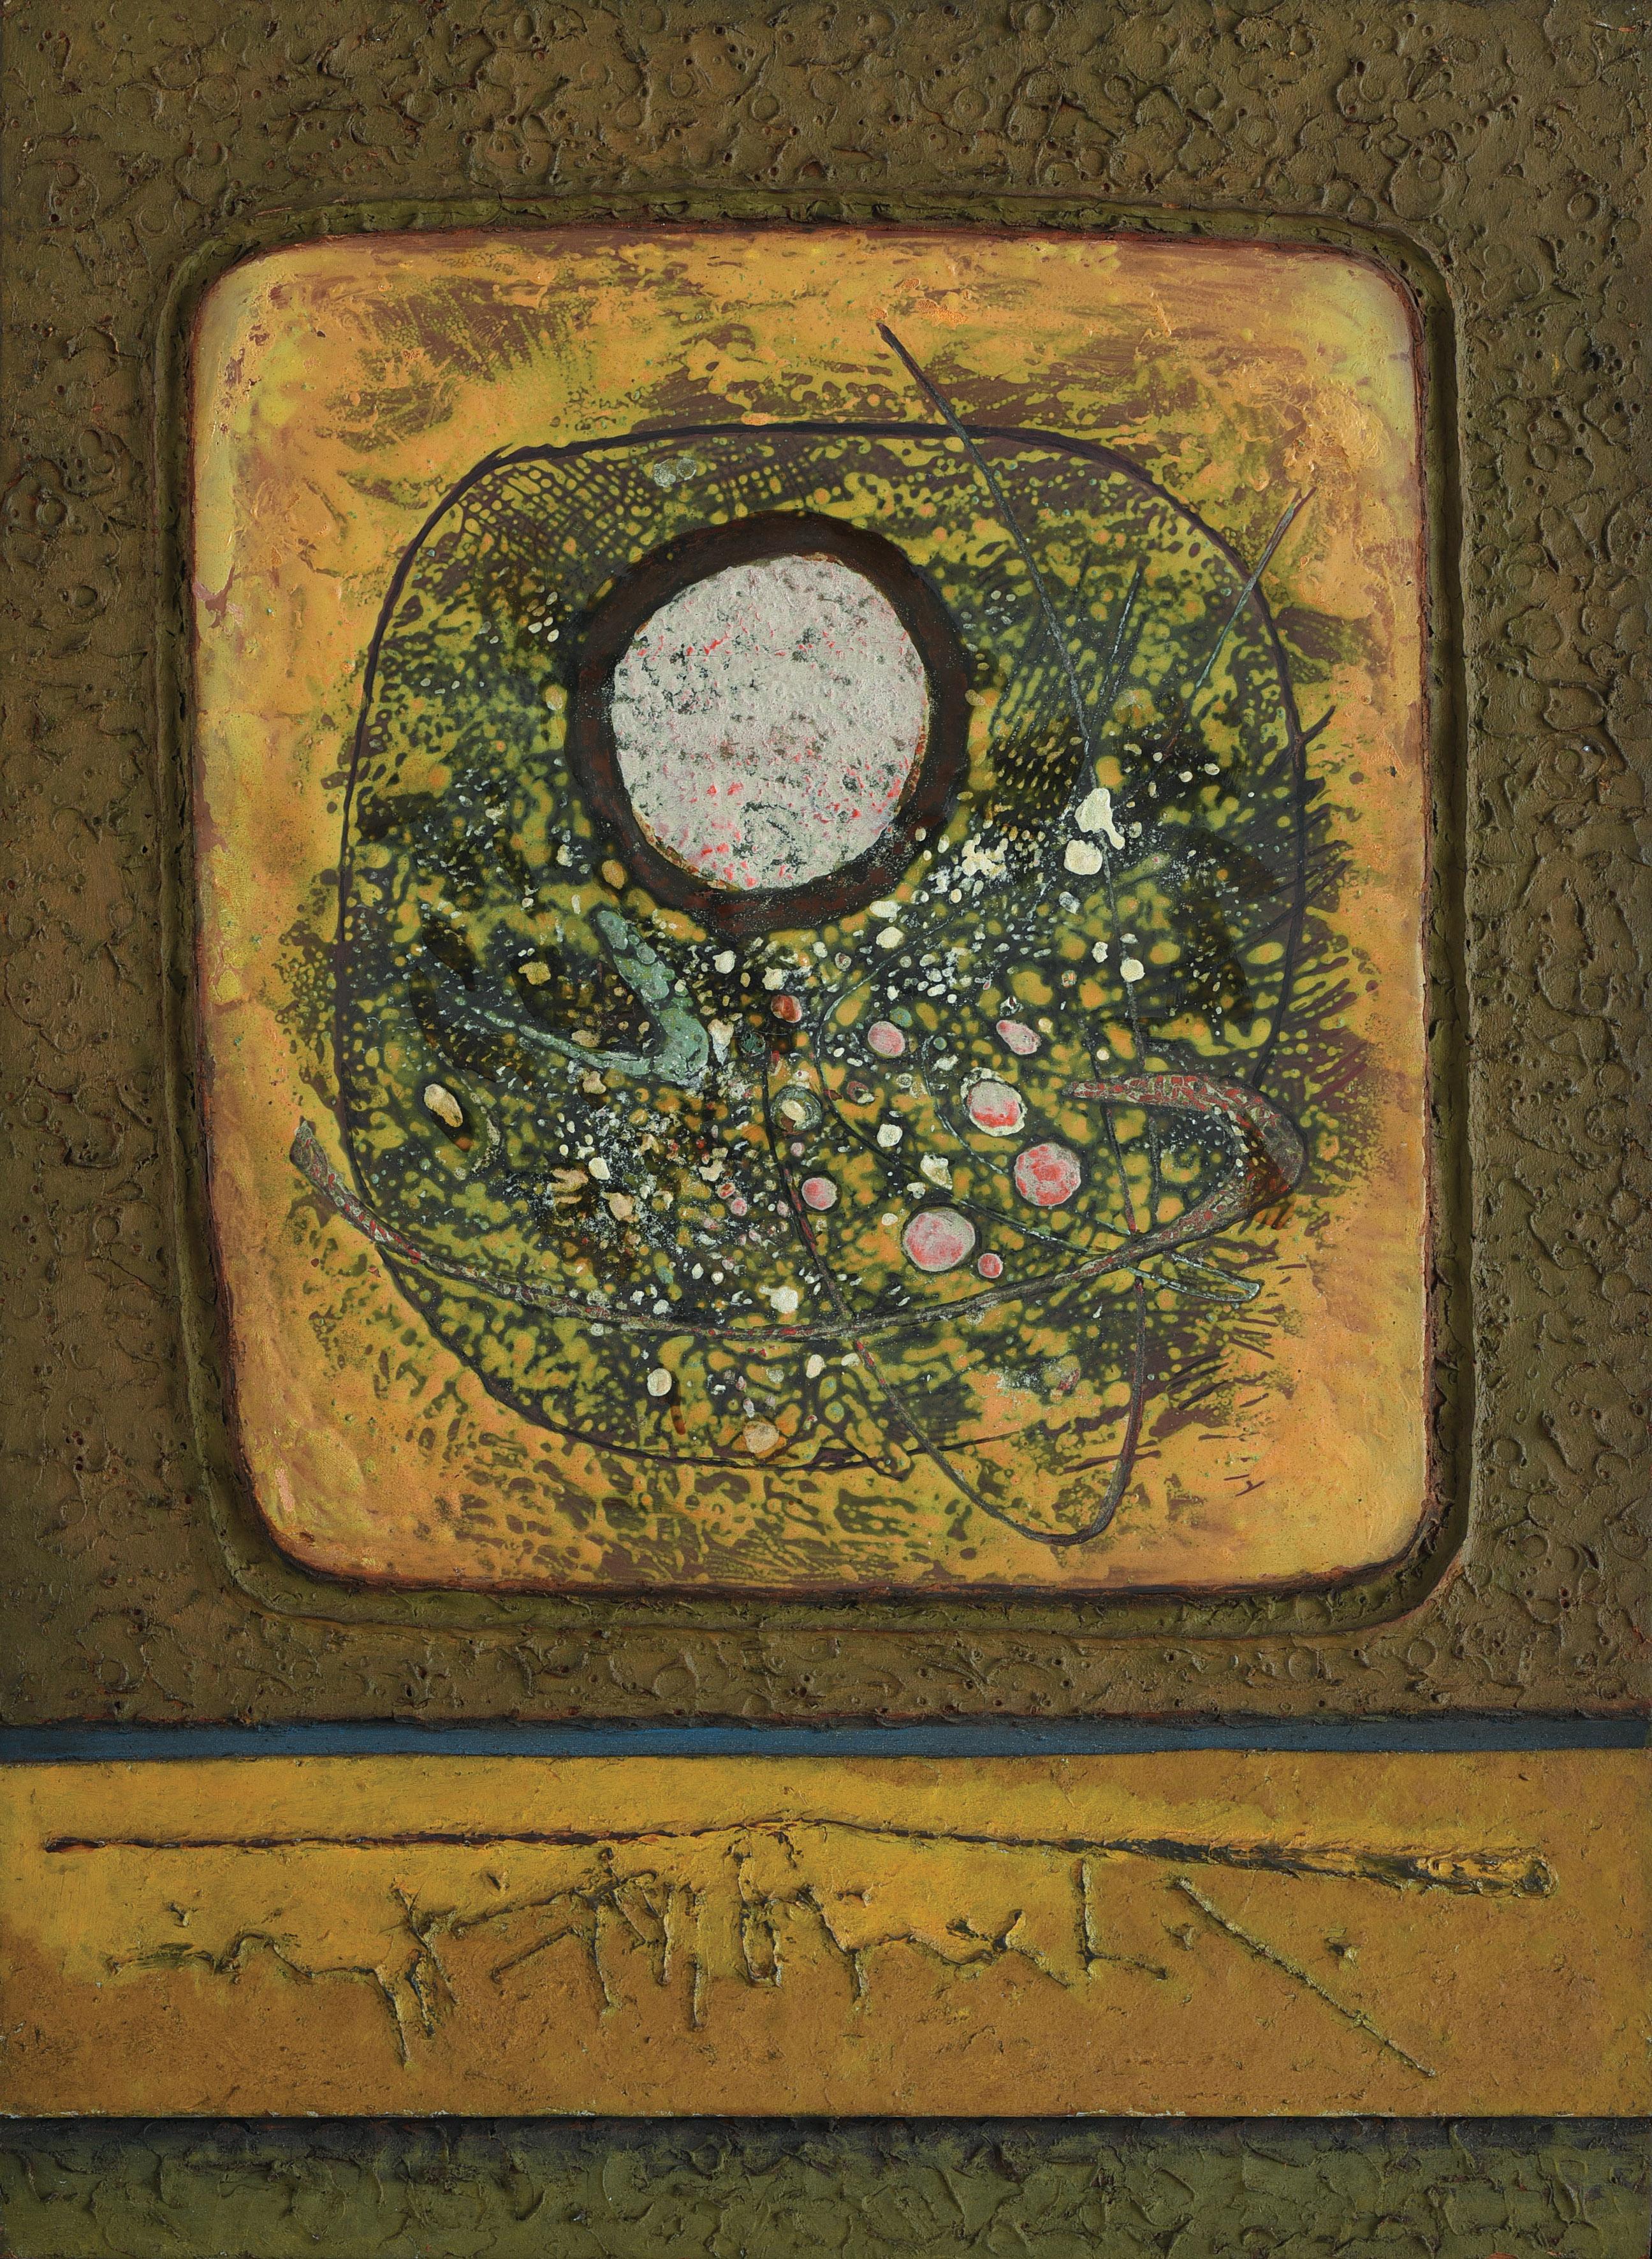 Cheong Soo Pieng, Radiance, mixed media on board, 84 x 61 cm, 1971